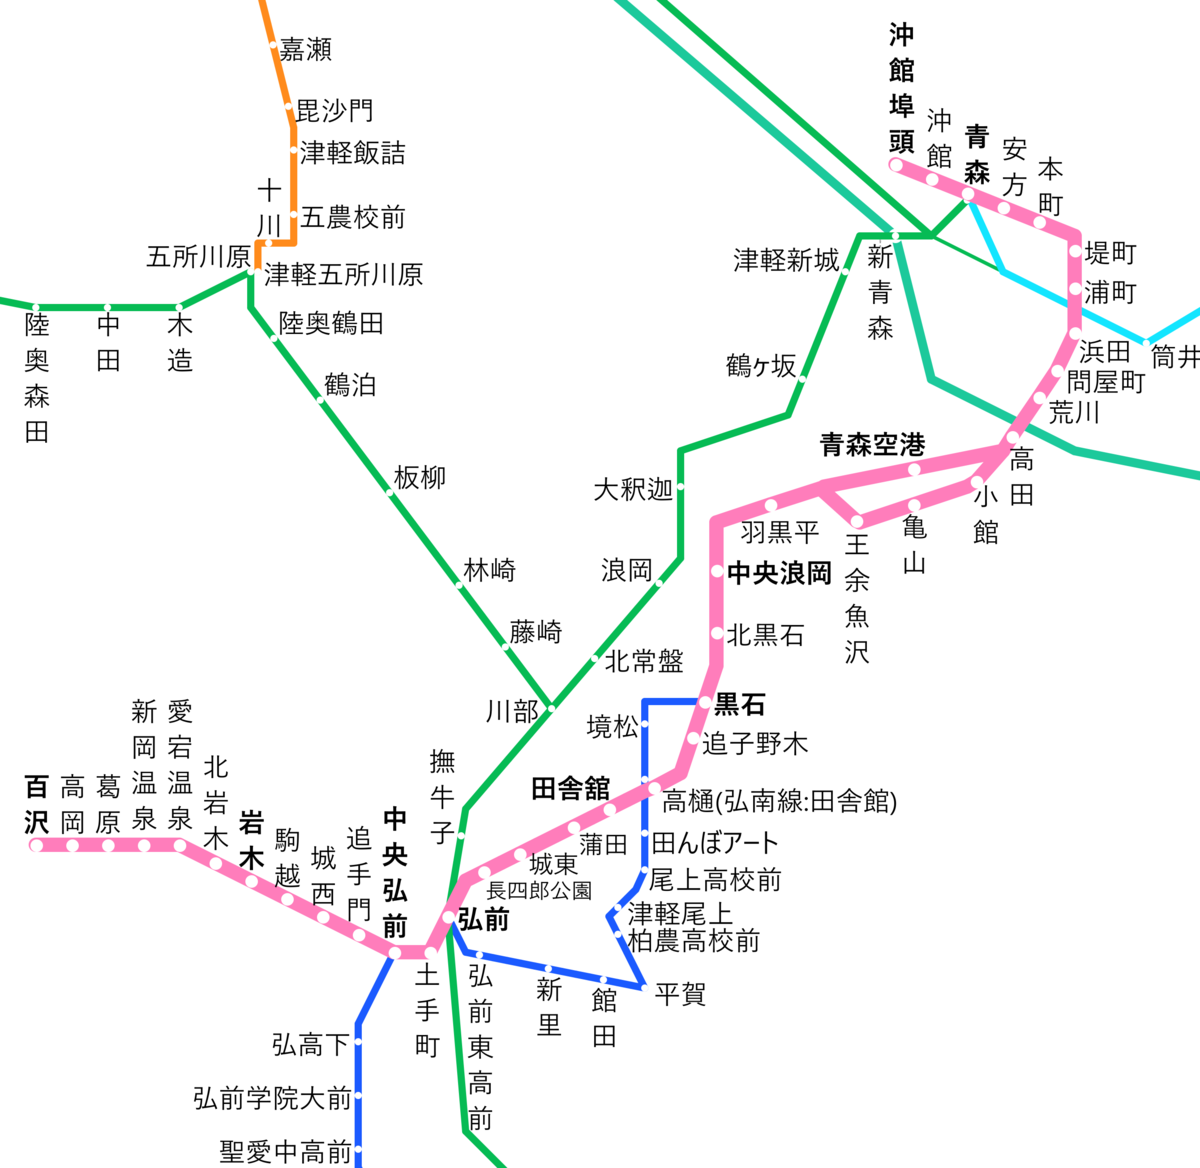 f:id:HOSHIIMO:20210723085327p:plain